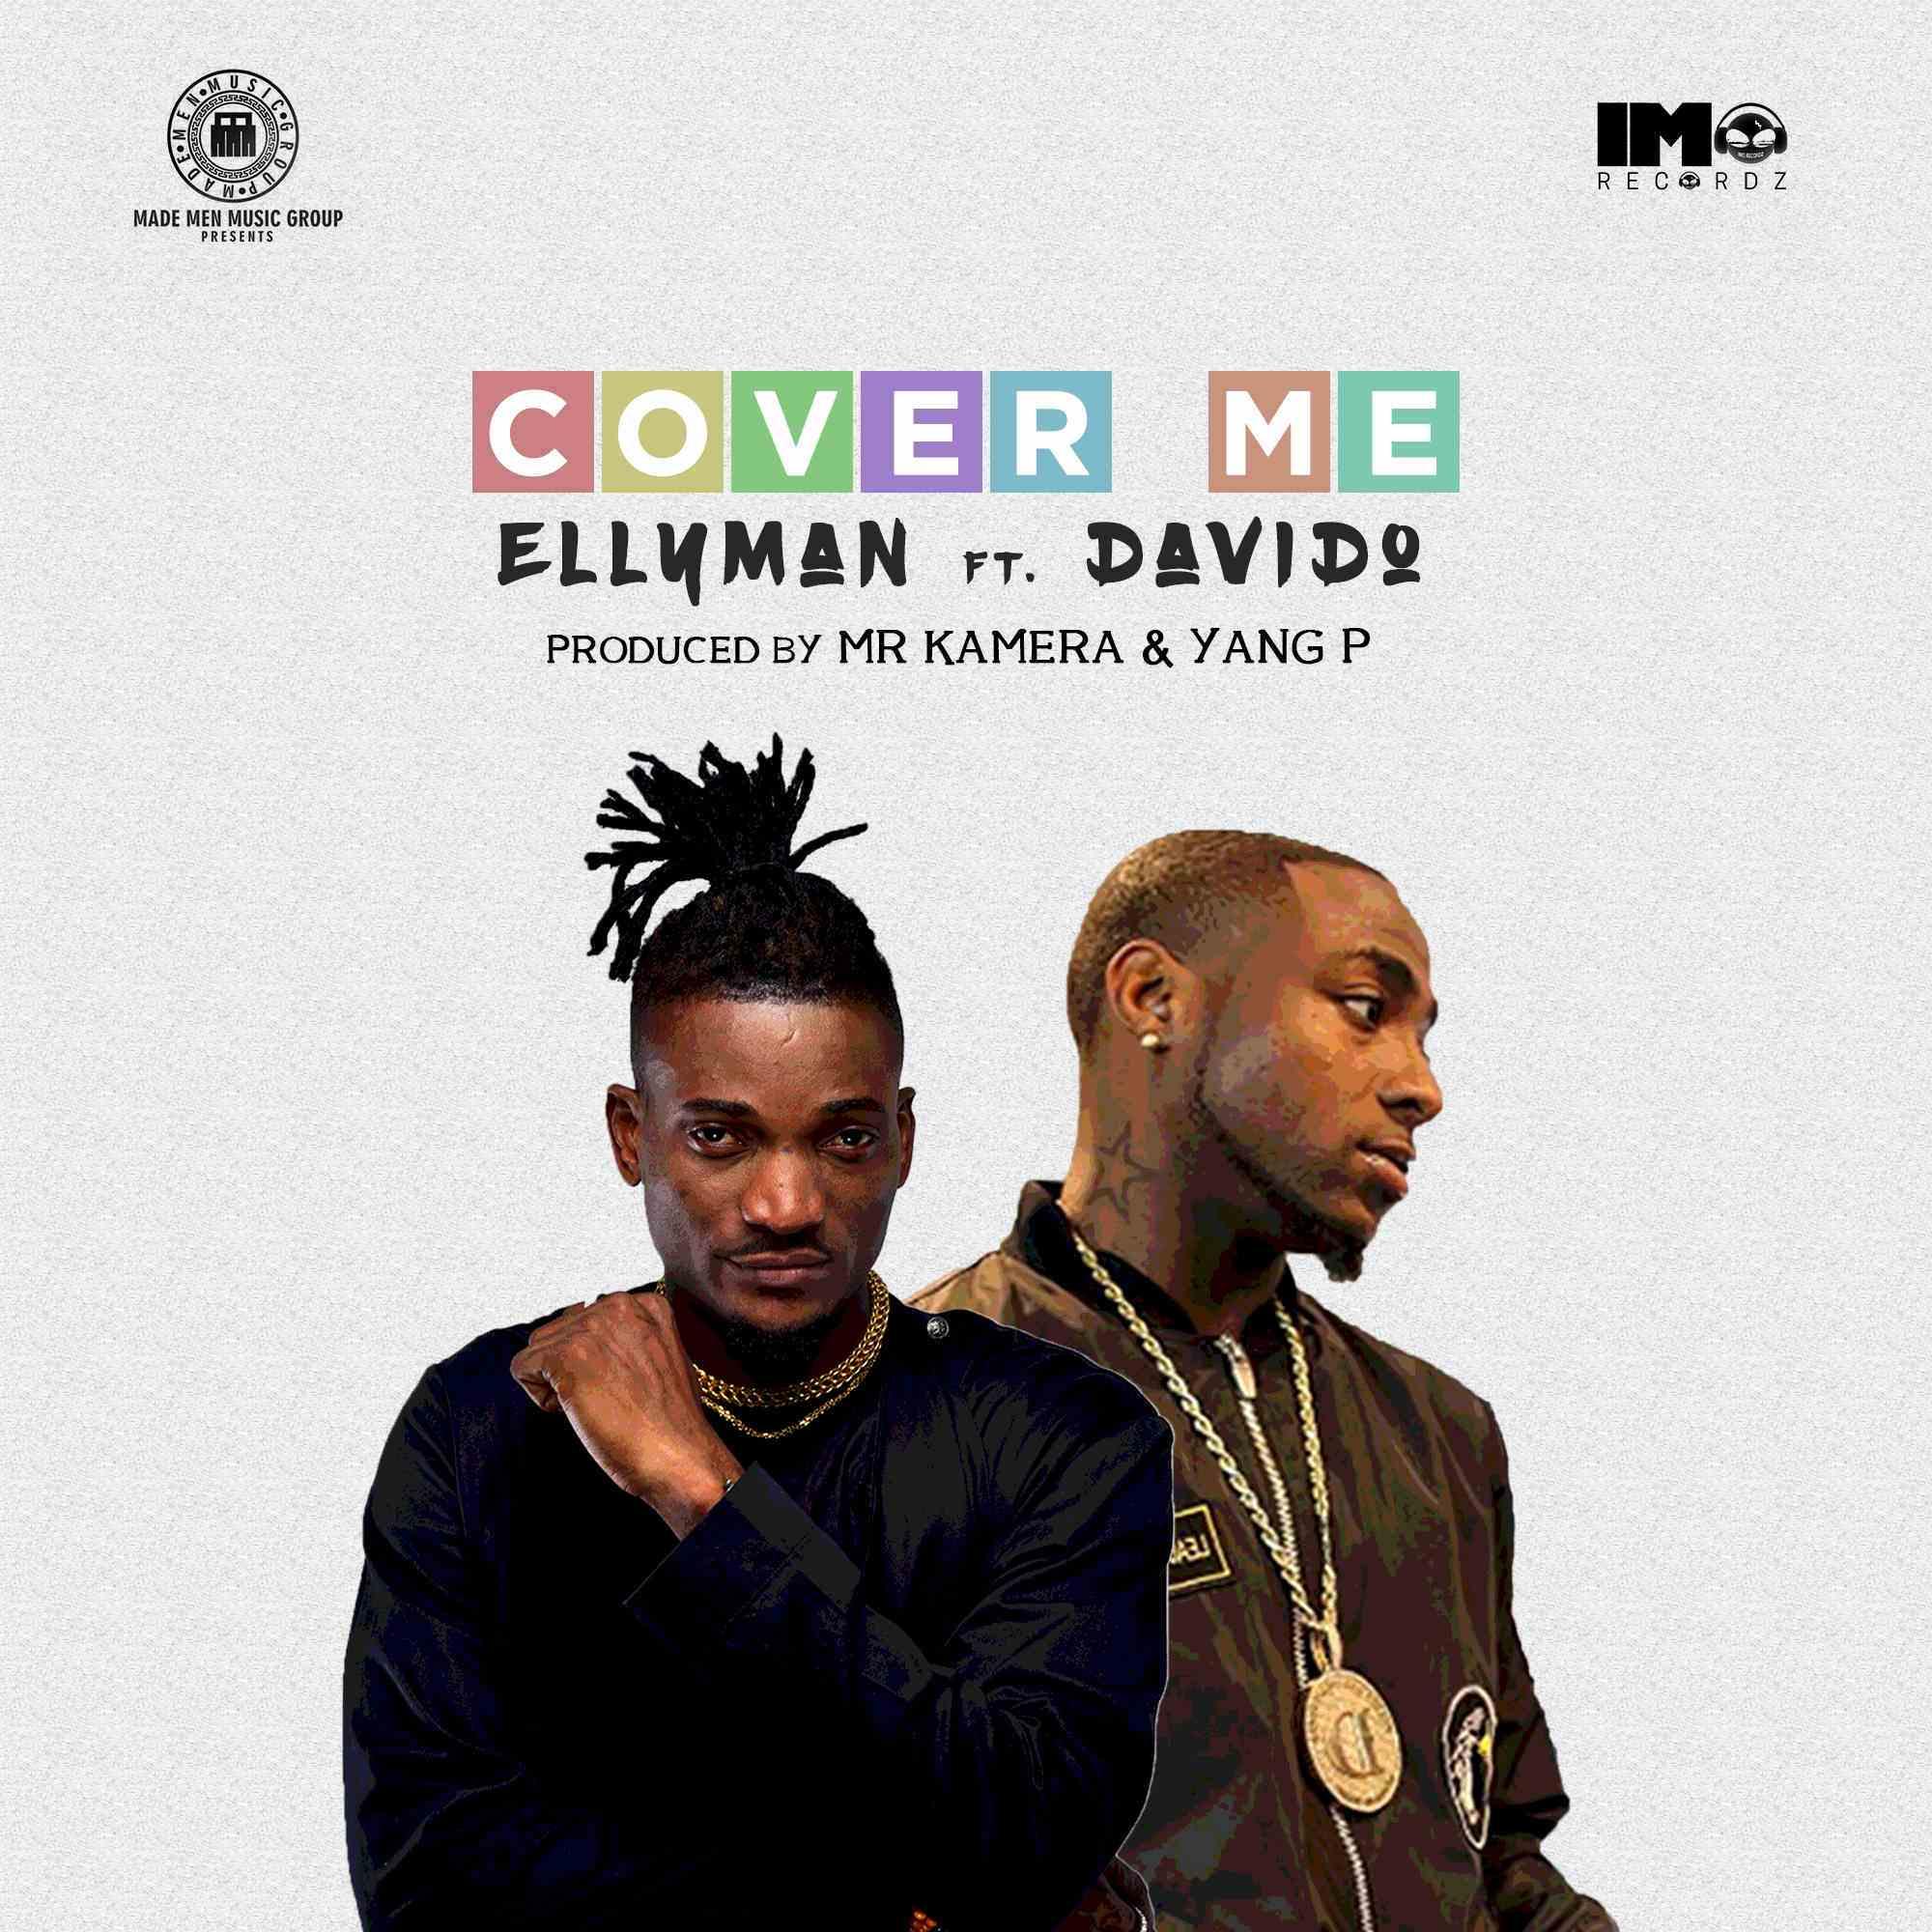 Ellyman ft Davido - Cover Me